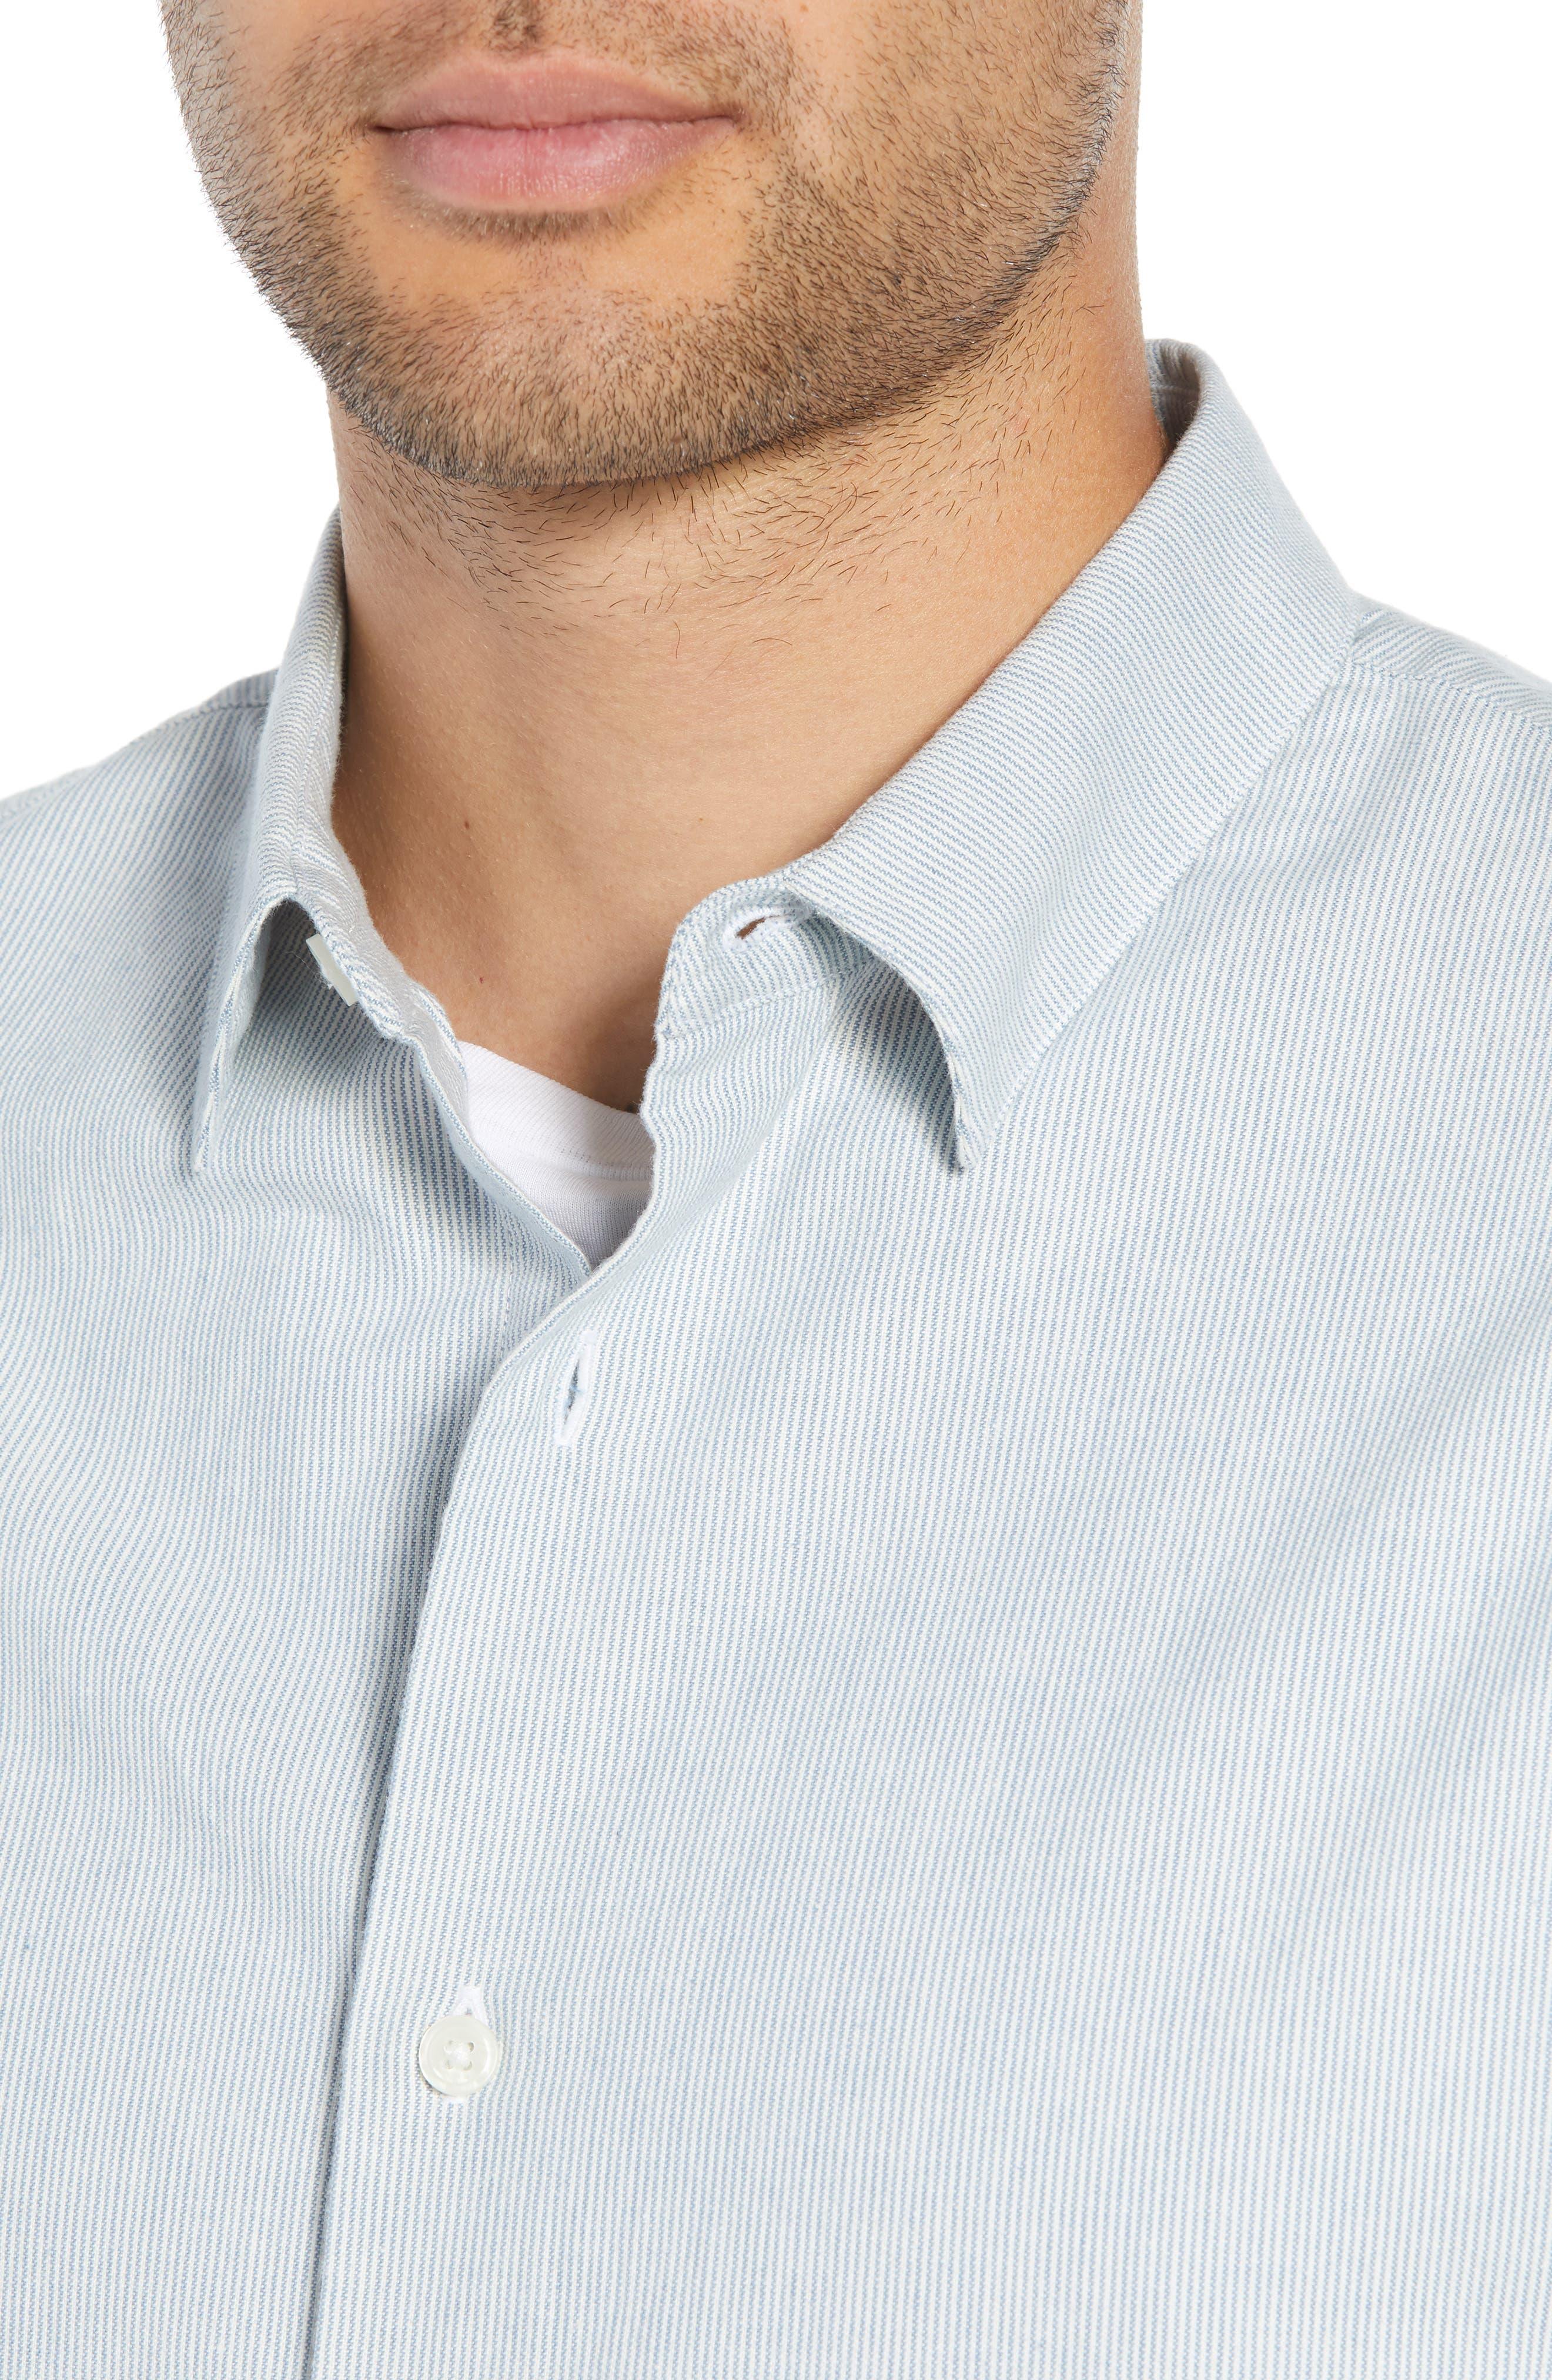 Classic Fit Microstripe Sport Shirt,                             Alternate thumbnail 2, color,                             424